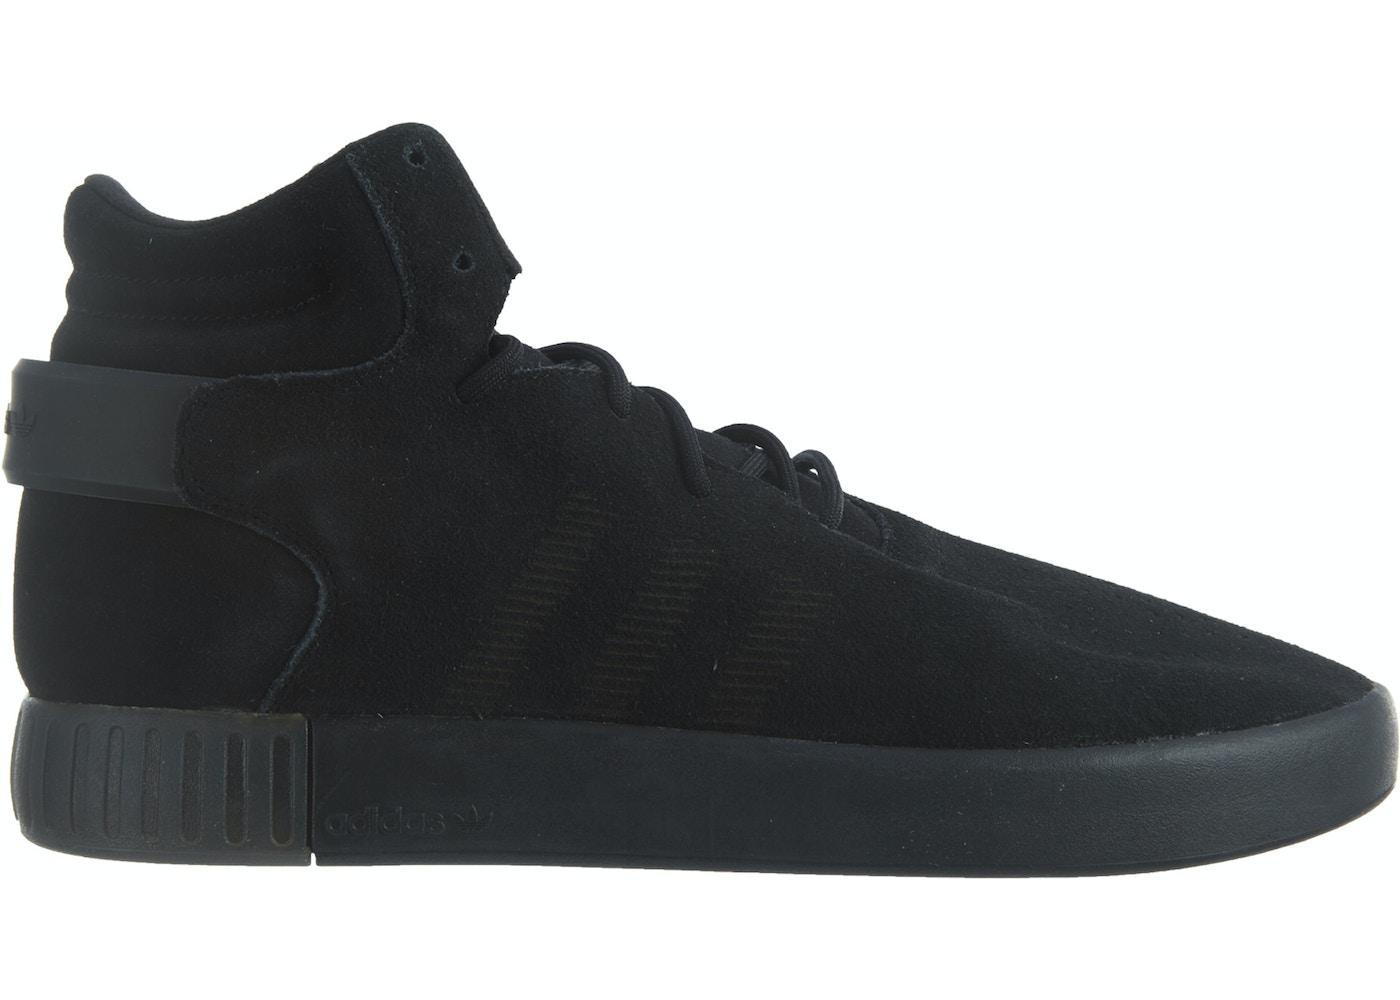 wholesale dealer 4a7f6 bd0aa adidas Tubular Invader Black/Black-Onix